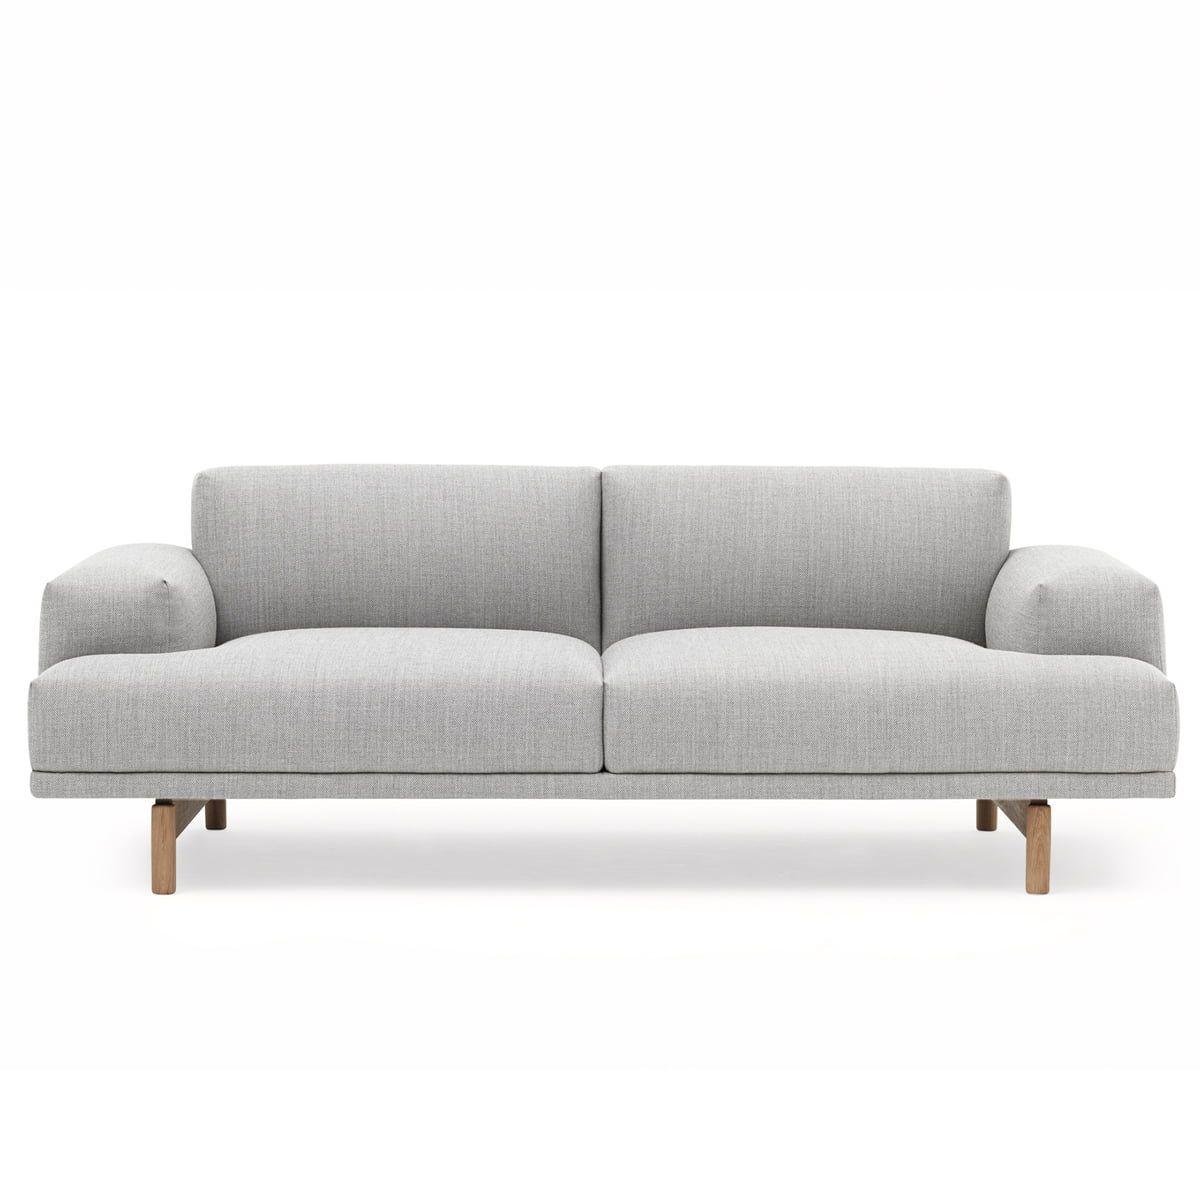 Muuto Compose Sofa 2 Seater Vancouver 13 Oak Sofa Kleines